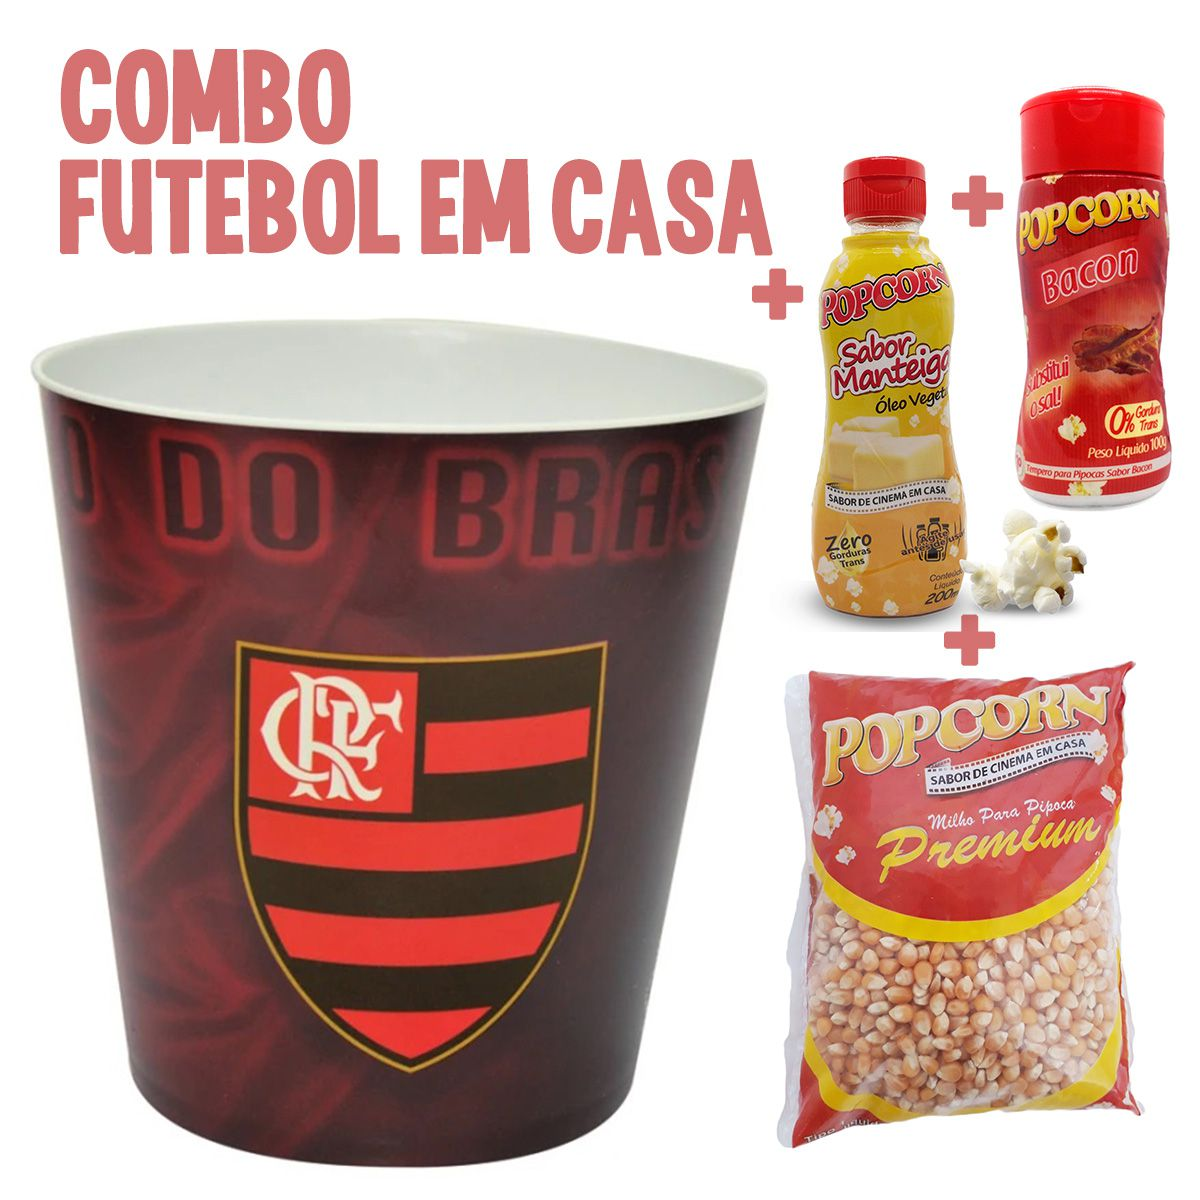 Combo Futebol em Casa + Balde do Flamengo